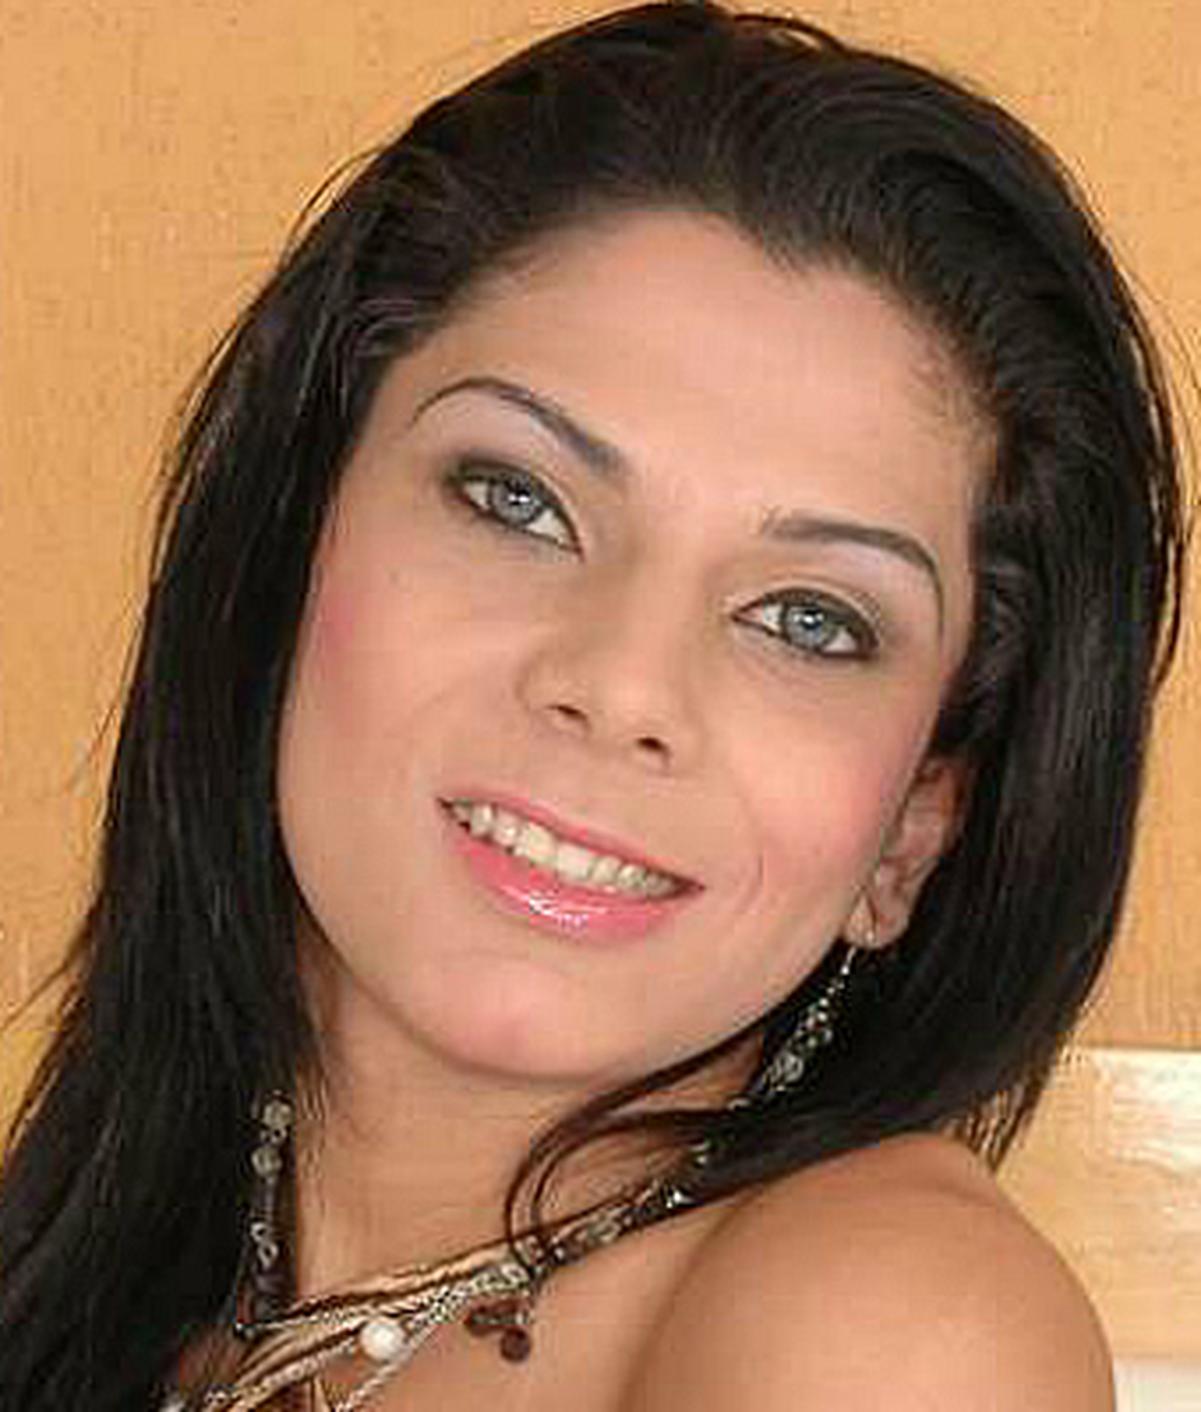 Sasha Hevyn